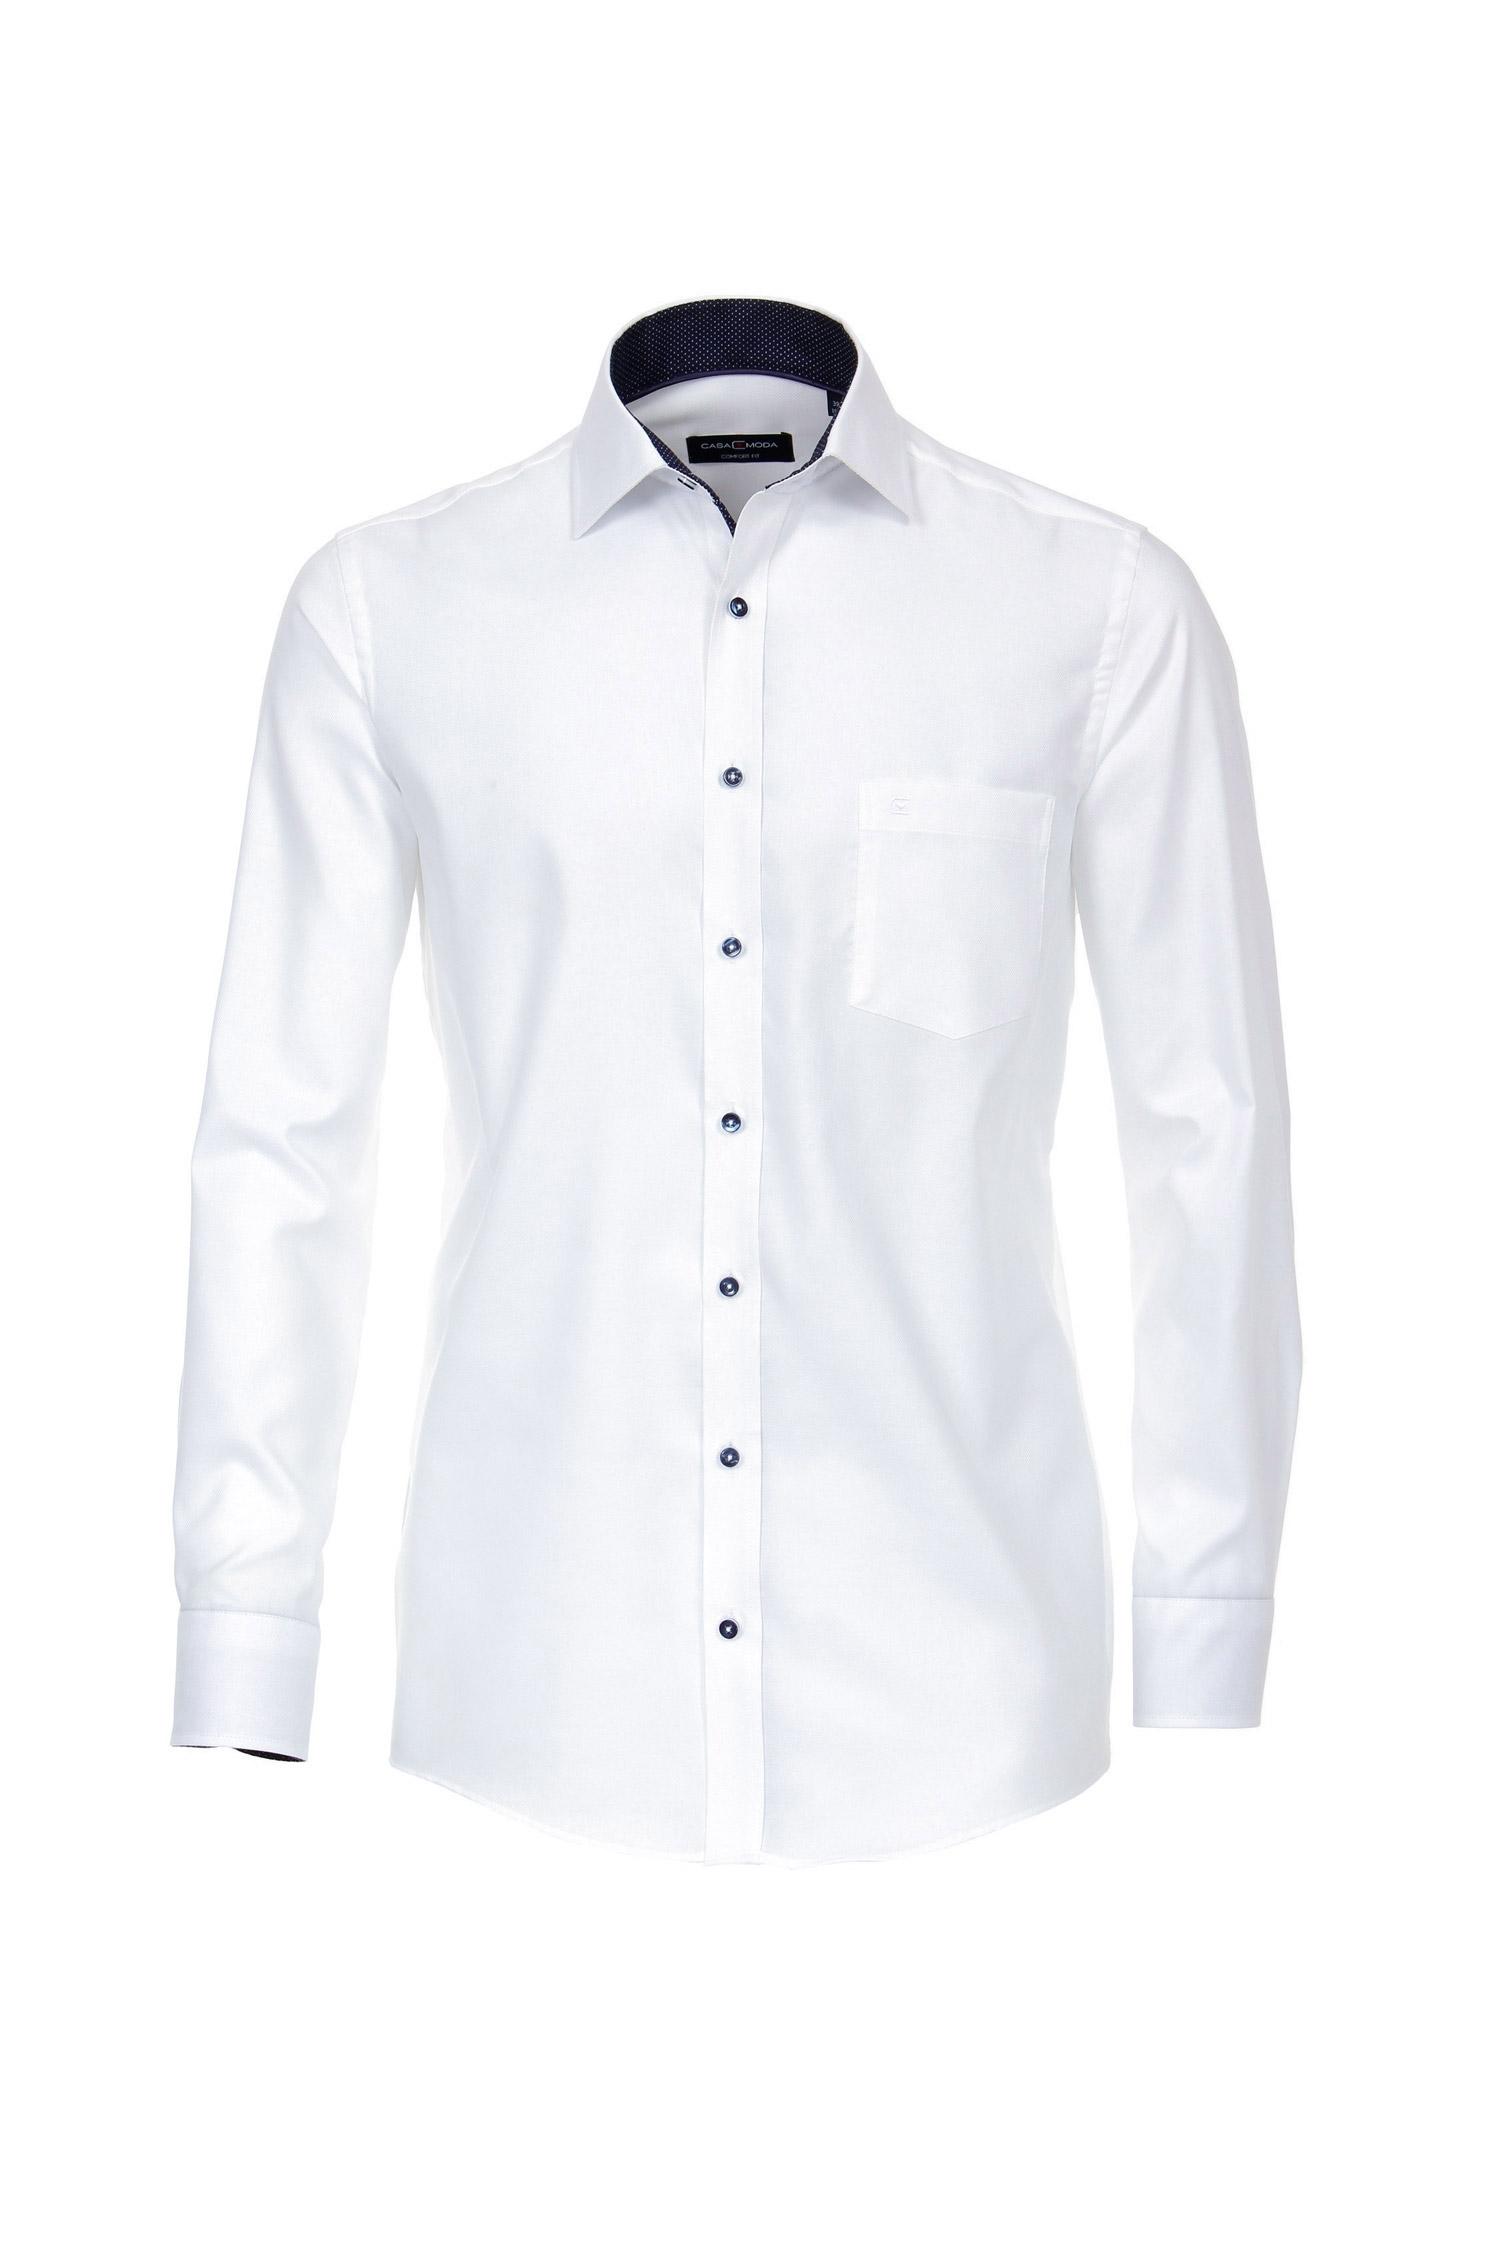 Camisas, Vestir Manga Larga, 109769, BLANCO   Zoom